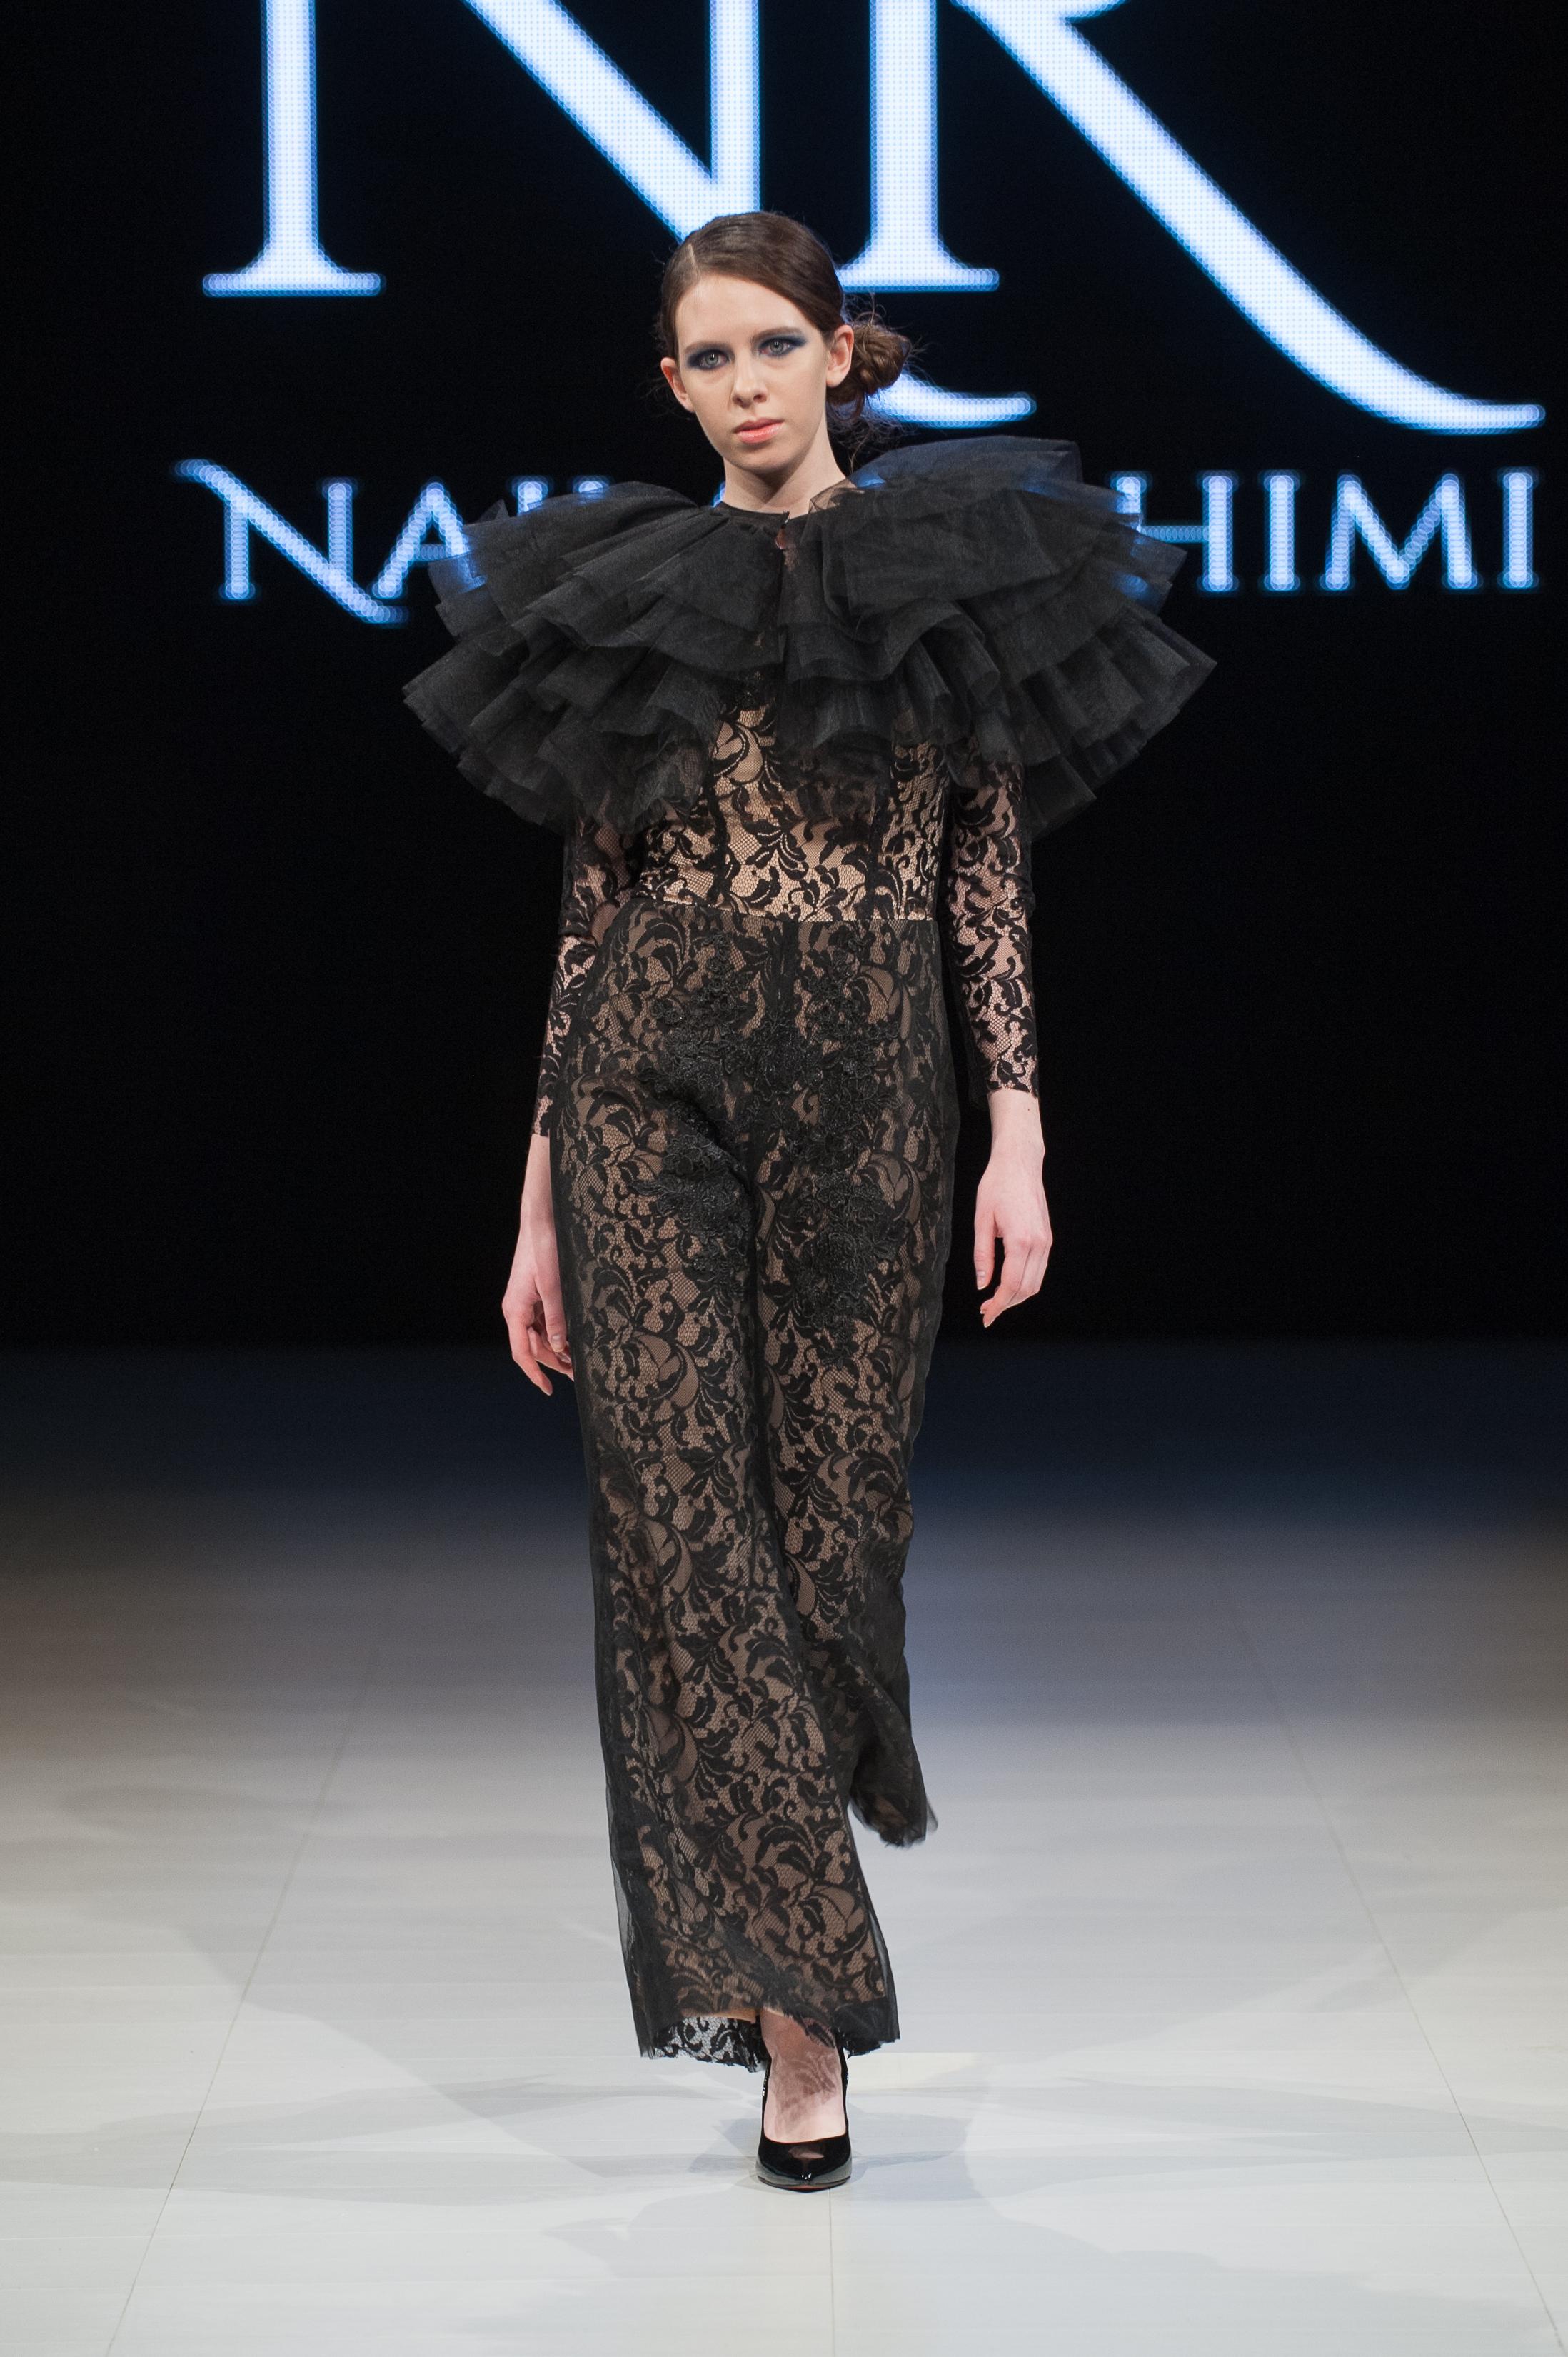 FAT2018-Day1-April17-Najla_Rahimi-Runway-Che_Rosales-LARAWAN-5828.jpg